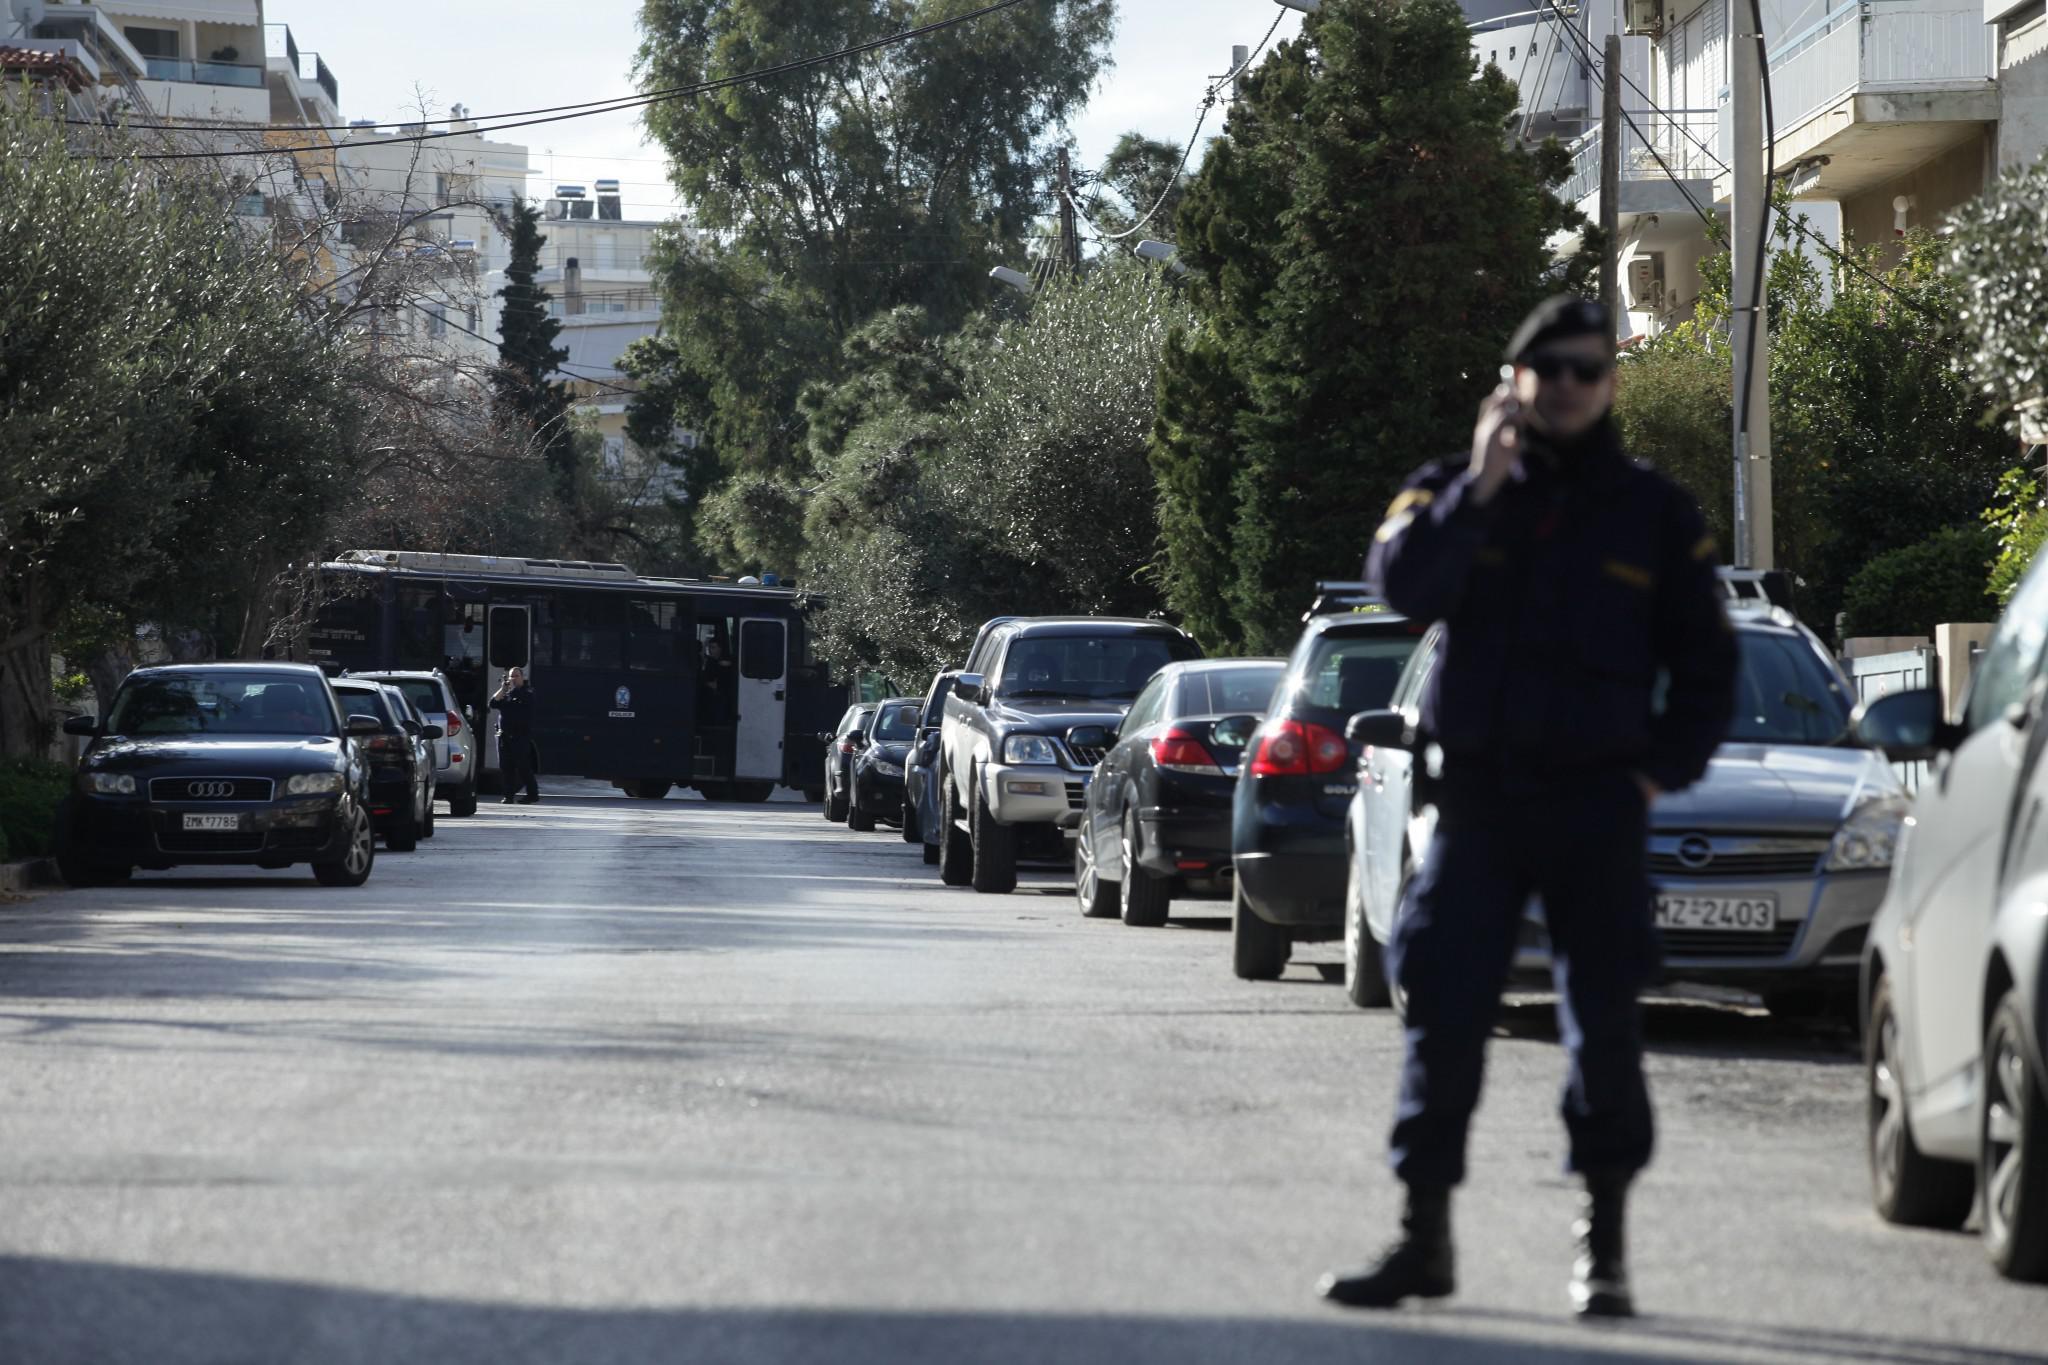 sullipsi-pola-roupa-antitromokratiki-maziotis-epanastatikos-agonas-9 Πώς έγινε η σύλληψη της συντρόφου του Νίκου Μαζιώτη, Πόλας Ρούπα –Τι είπε στους αστυνομικούς